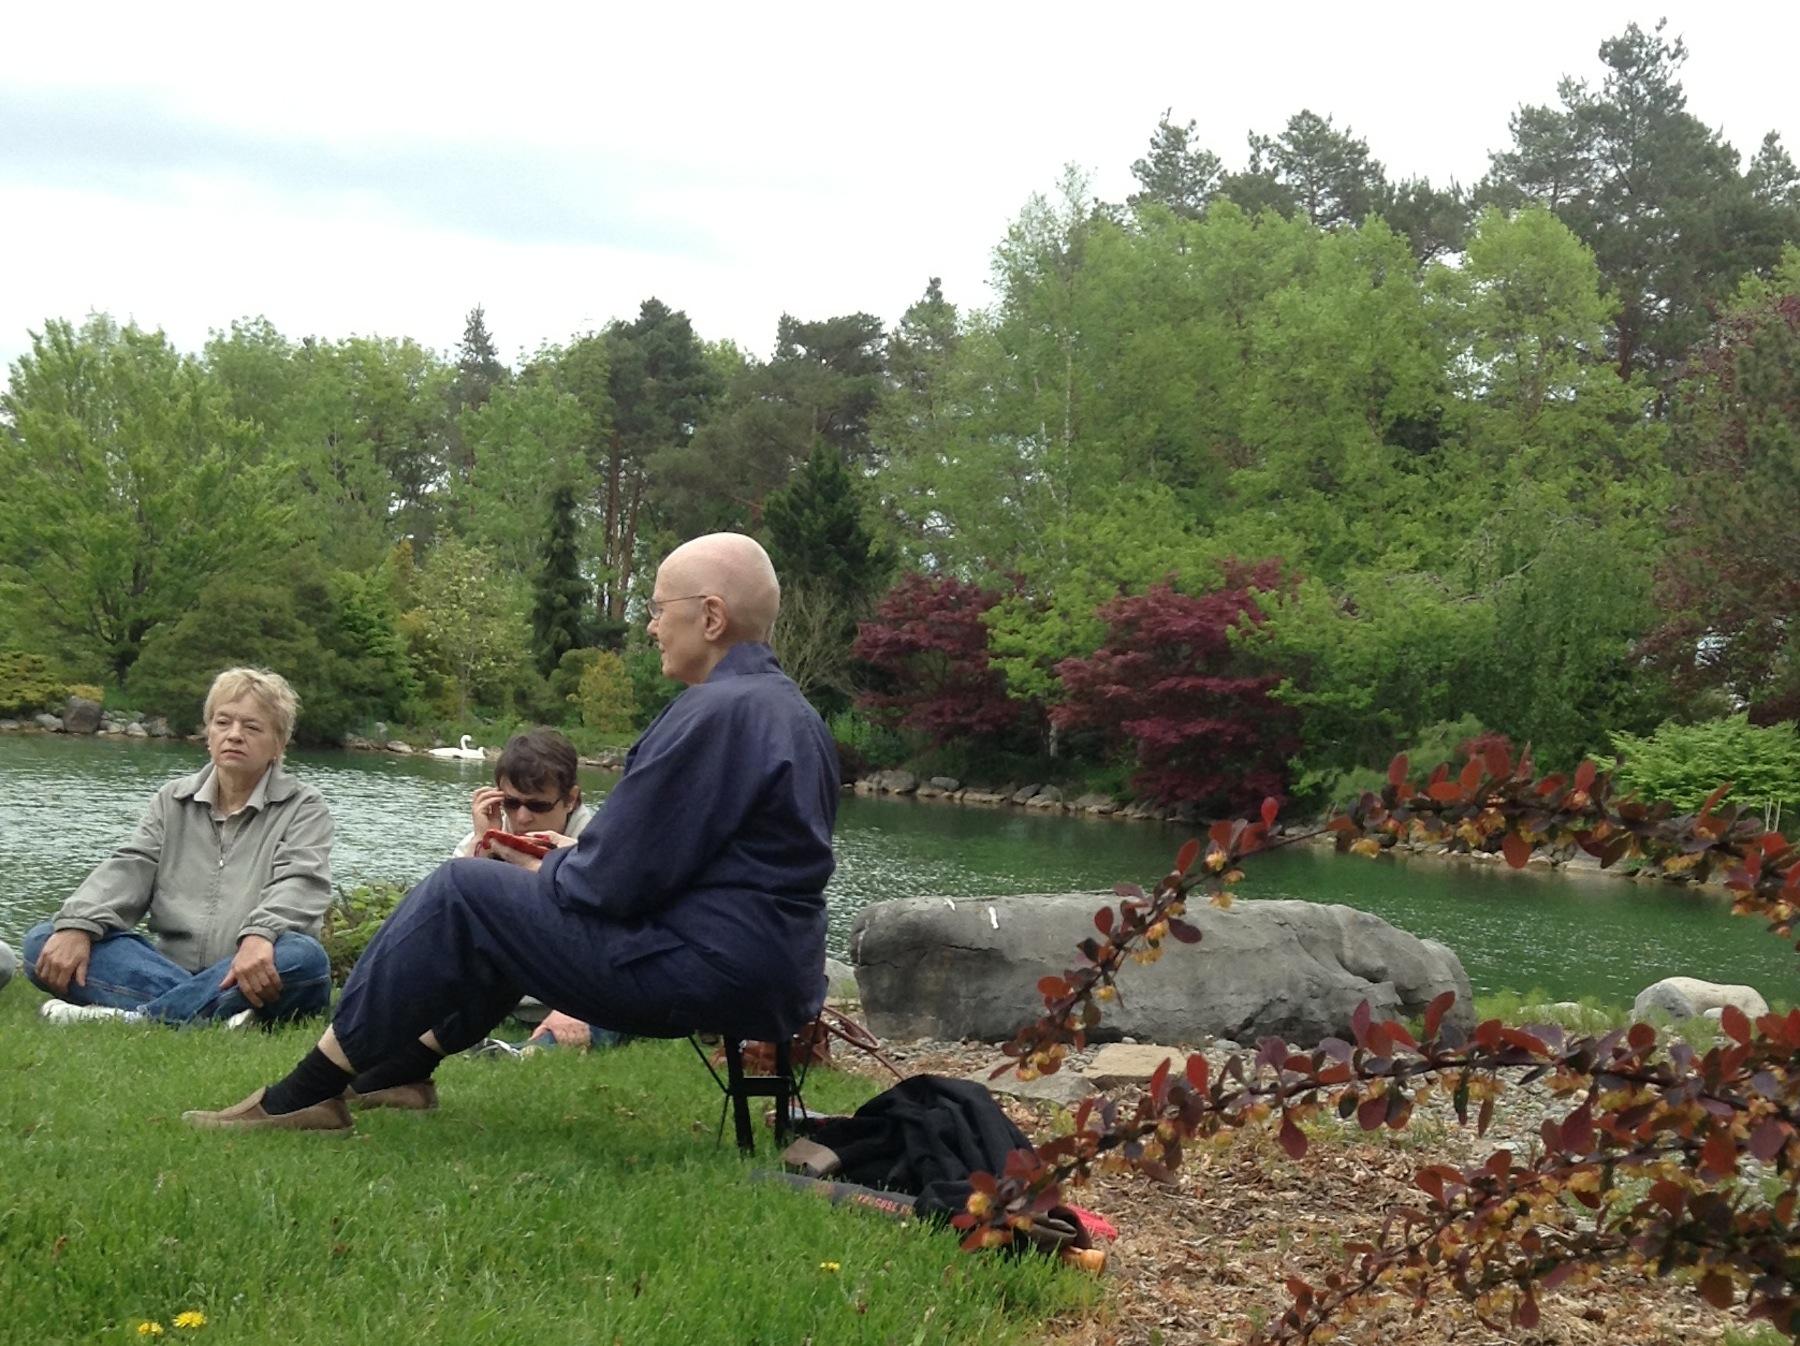 A Zen meditation